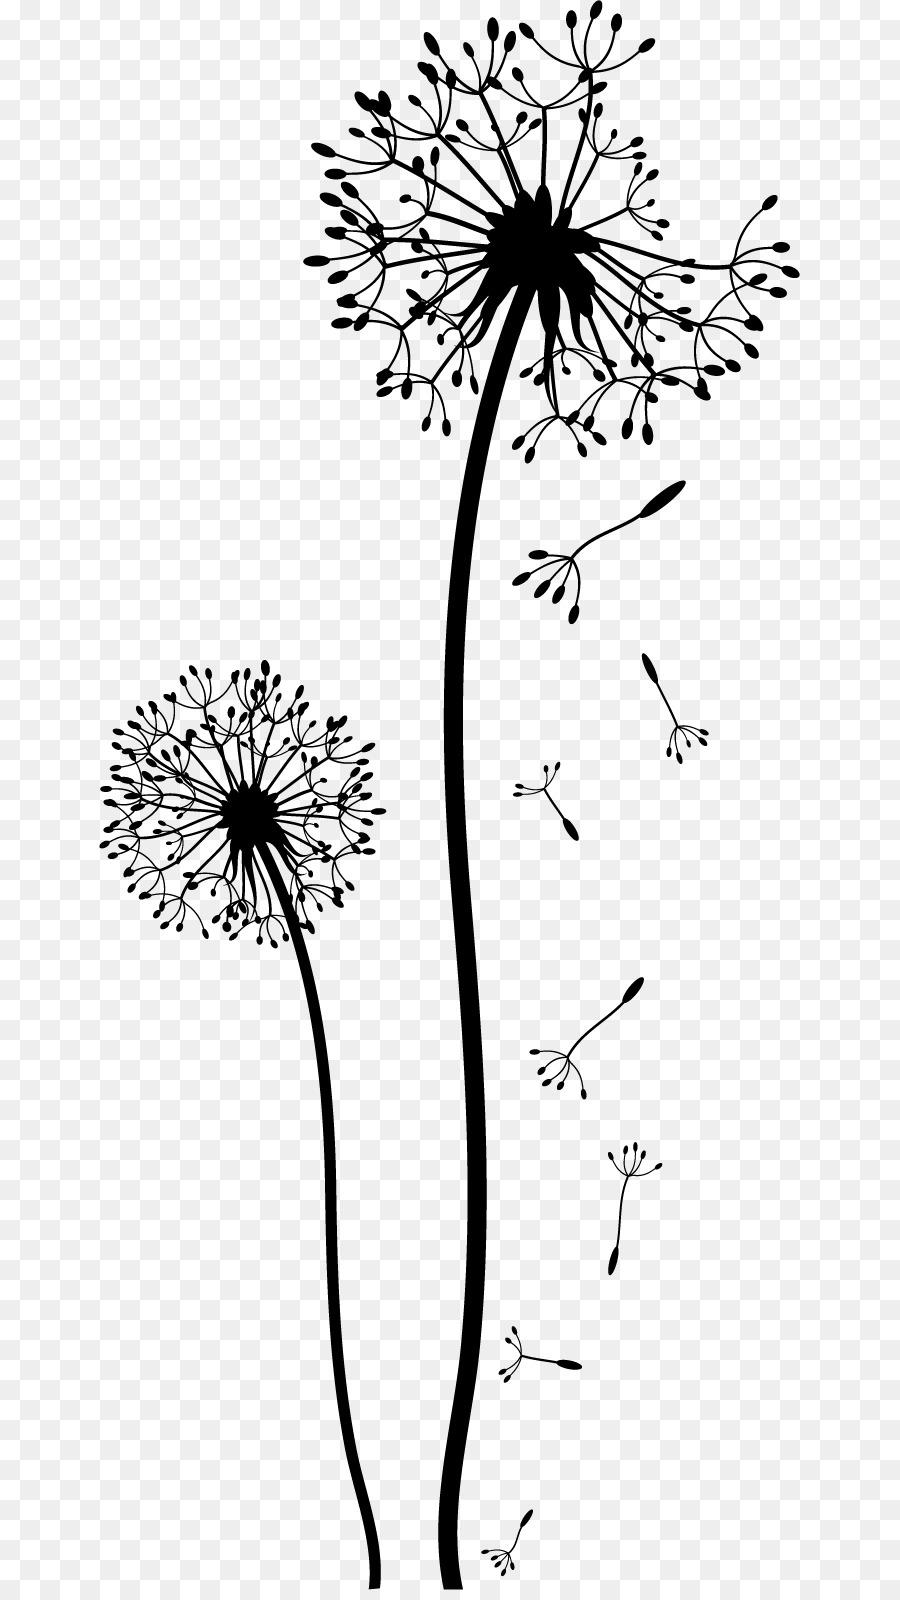 Dandelion drawing black and white clip art flower wall png dandelion drawing black and white clip art flower wall mightylinksfo